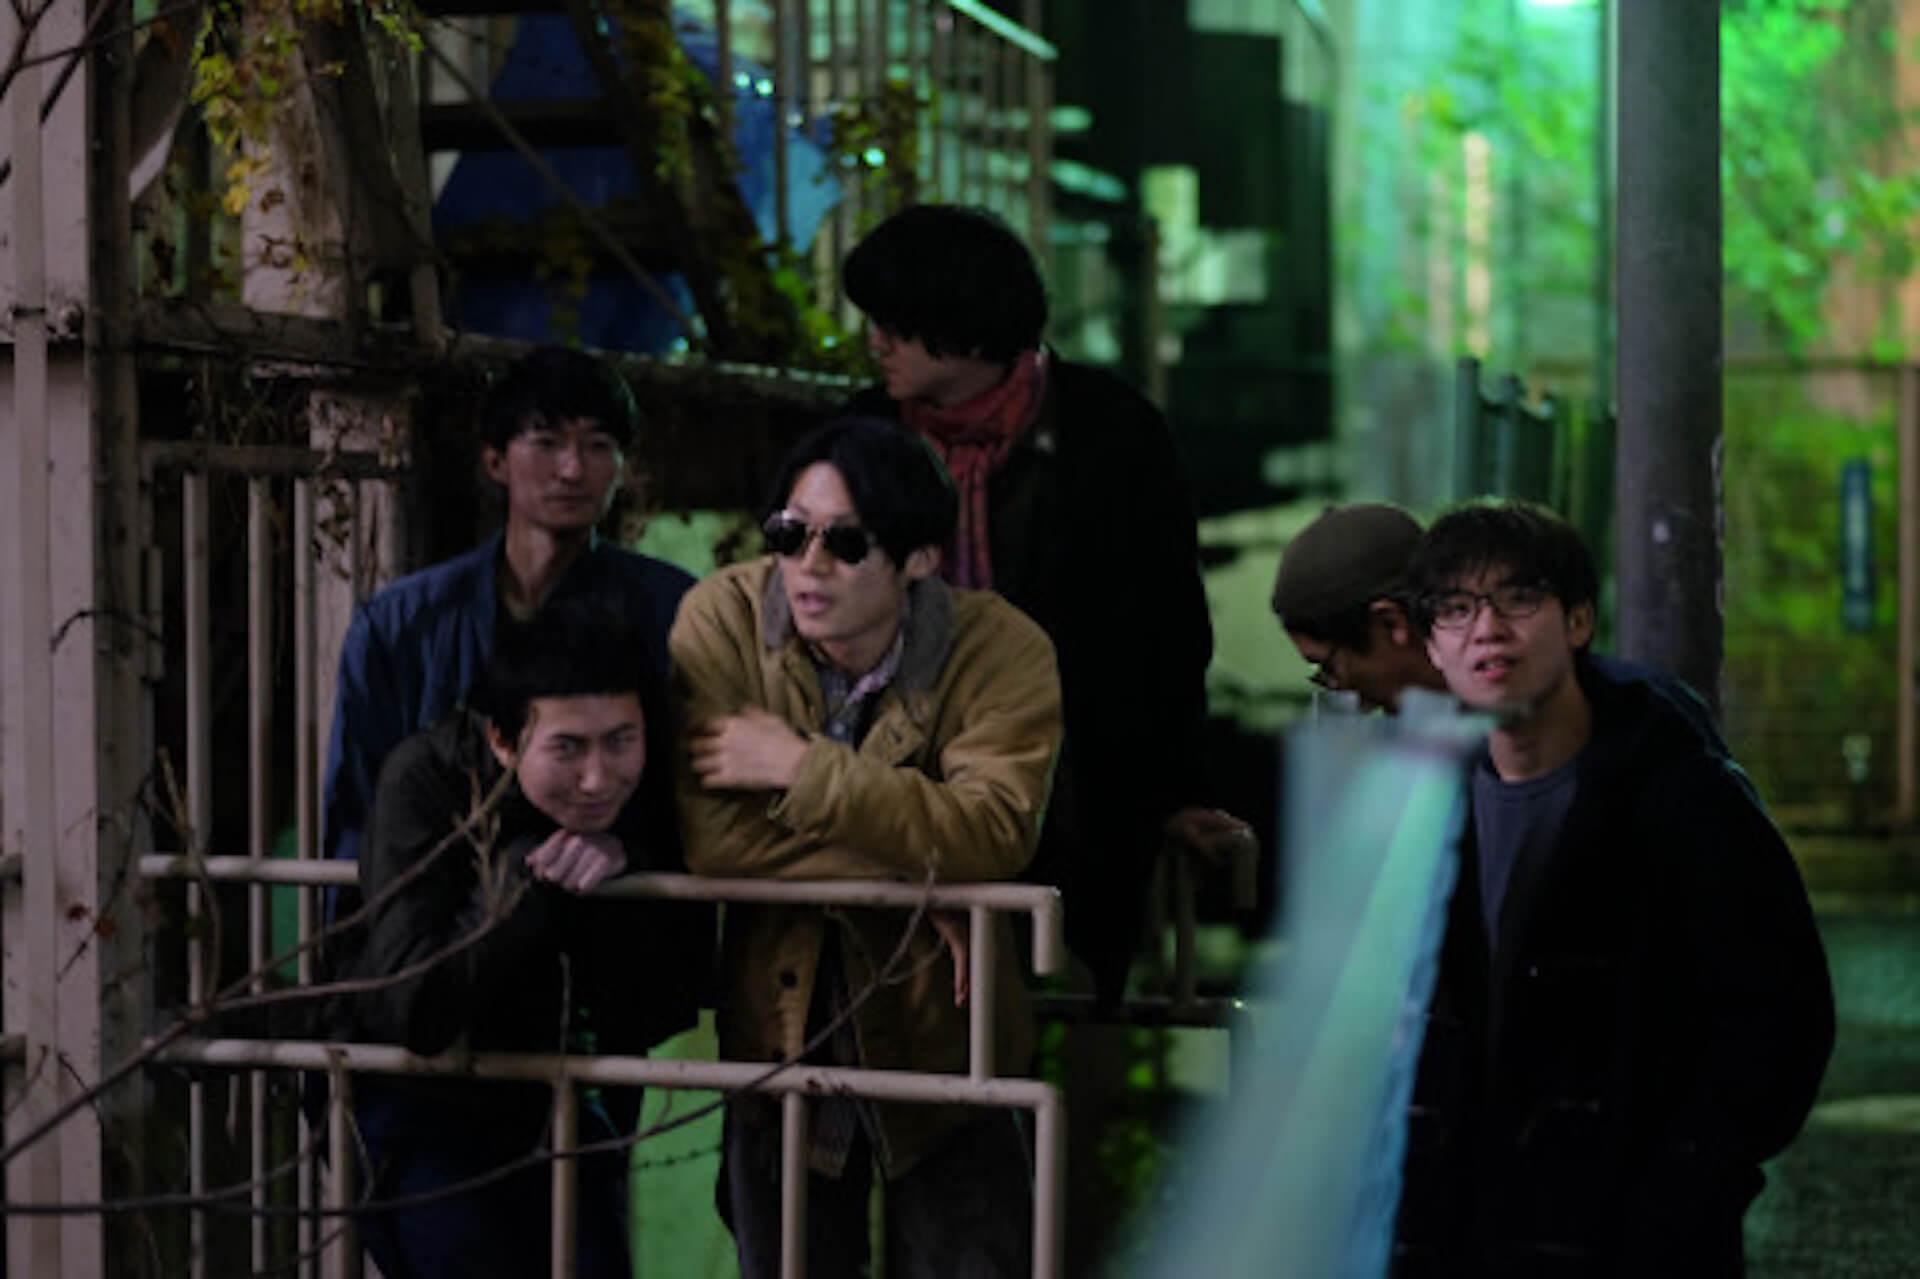 South Penguin、ファーストアルバム『Y』のリリースパーティーが11月に開催|ゲストにDos Monos、No Buses、MIRU SHINODAが登場 music190902-southpenguin-1